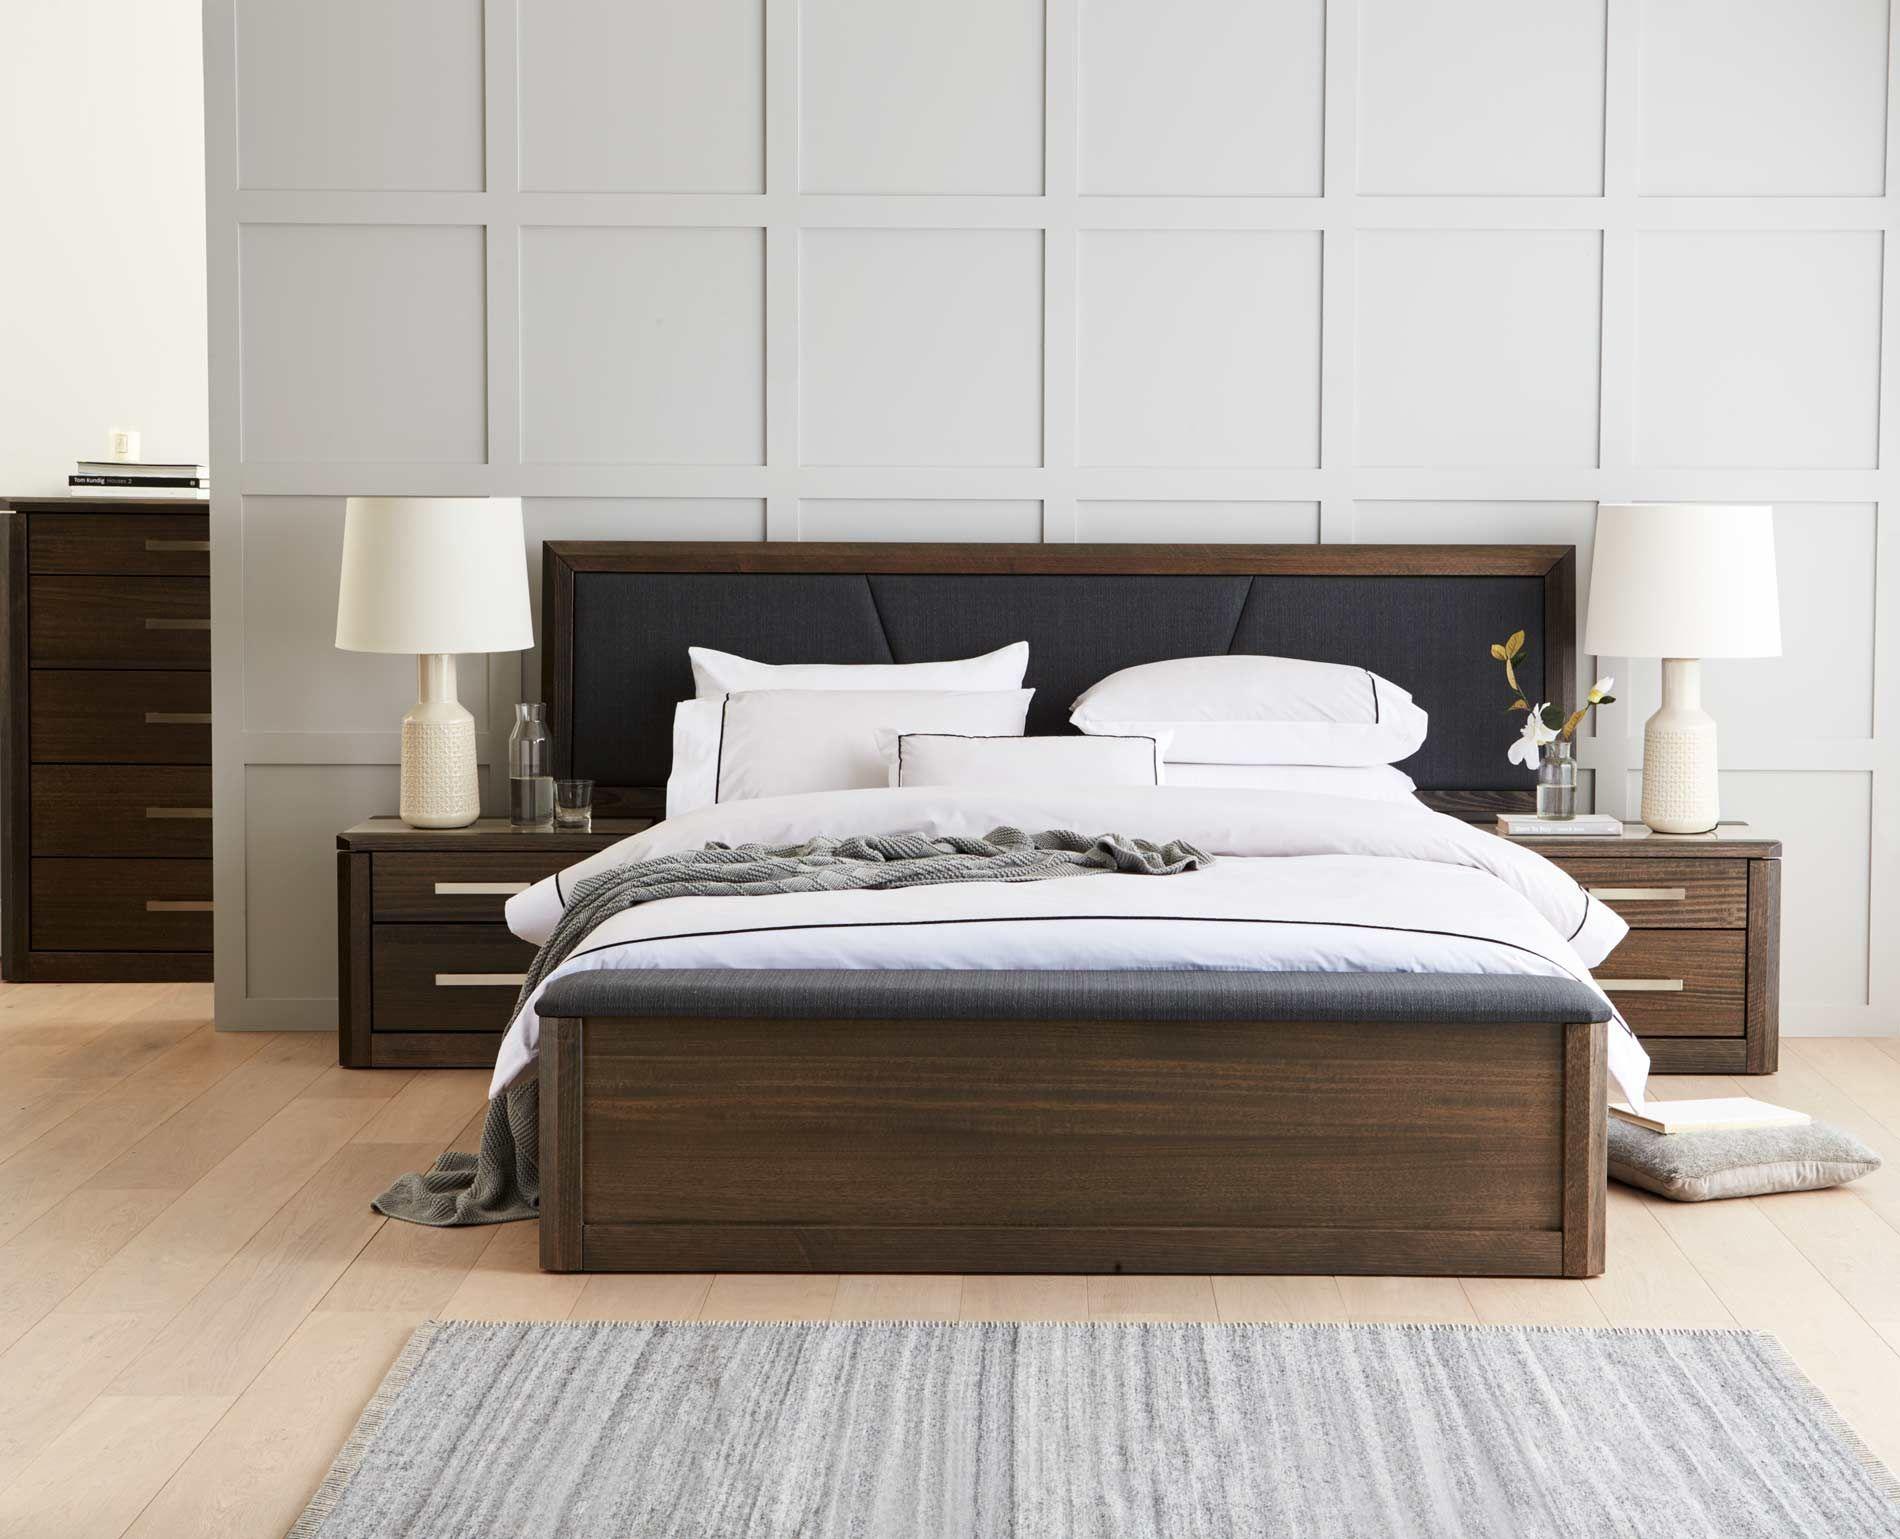 Maitland Qb Bed W Box Foot Storage Charcoal Custom Bed Furniture Design Bed Furniture Charcoal Bedroom Furniture